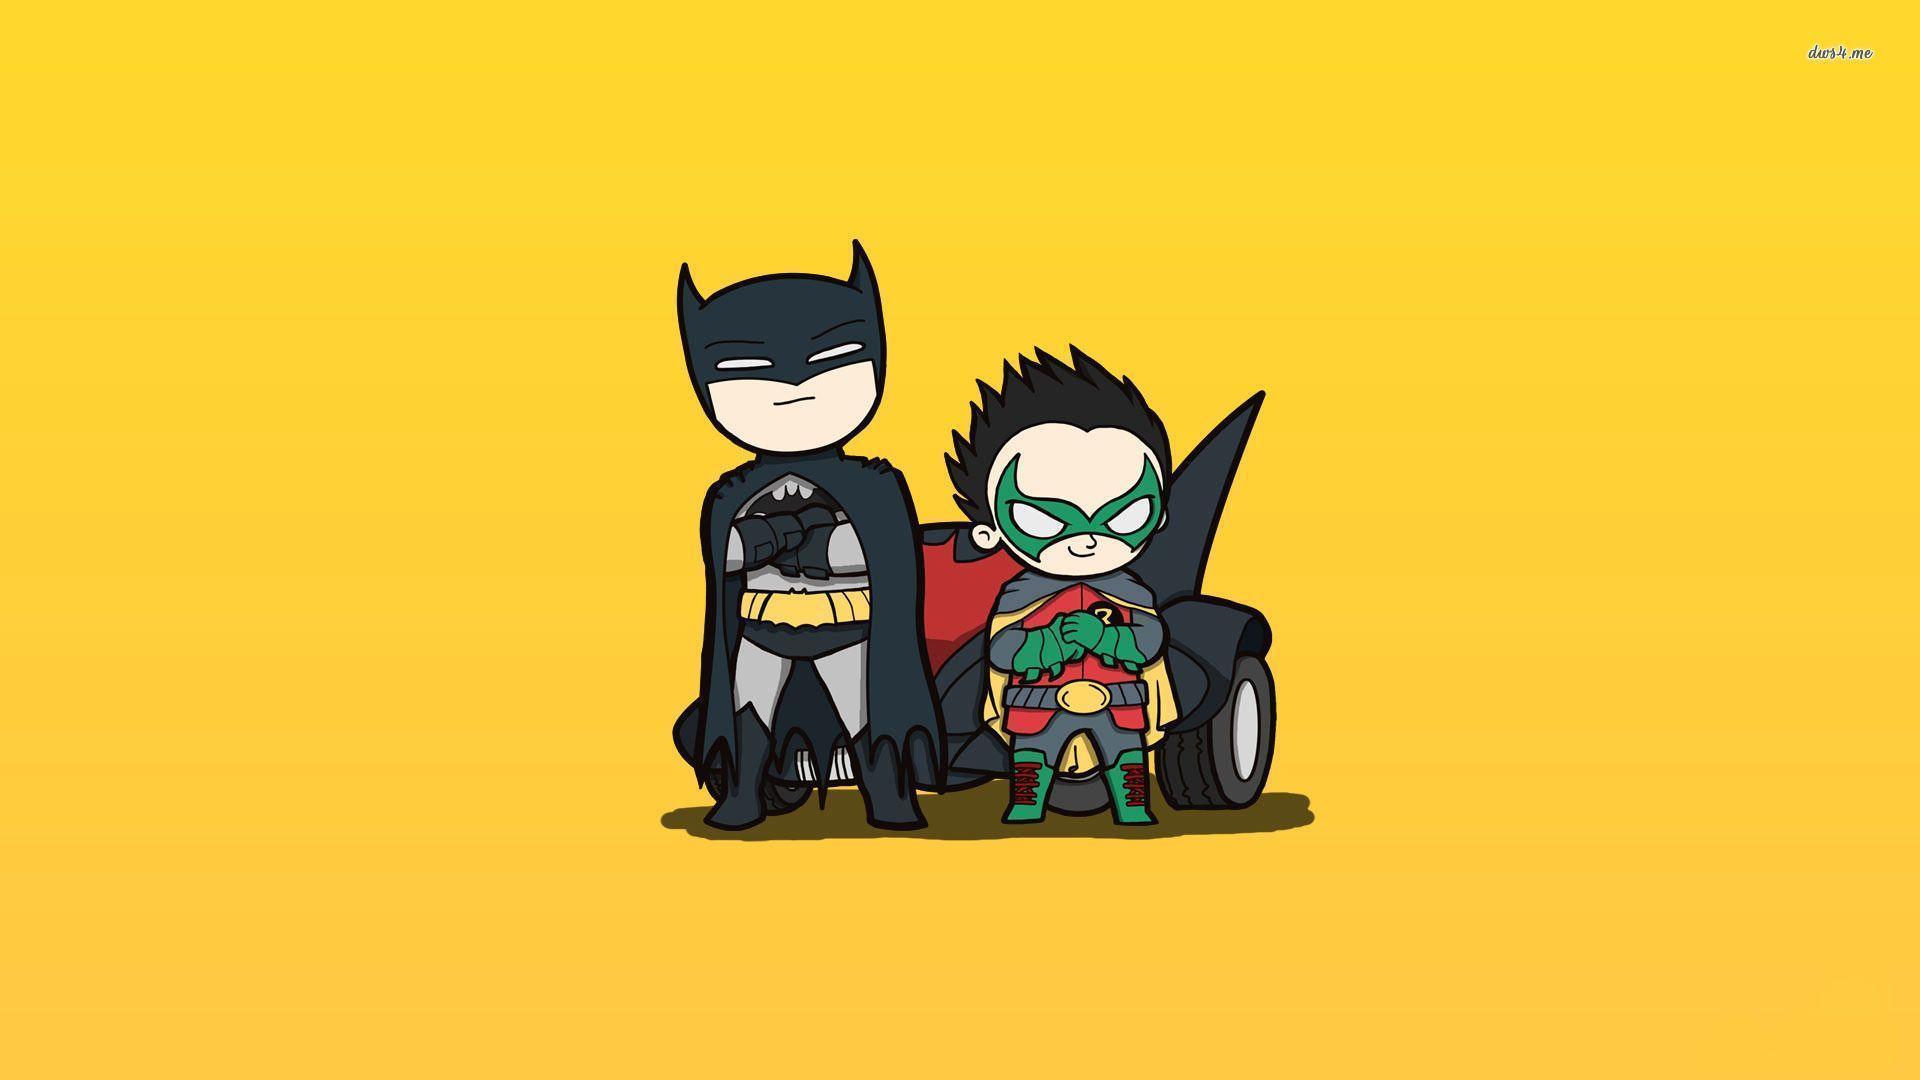 17 Best images about Batman Wallpaper on Pinterest | Logos, Batman ...